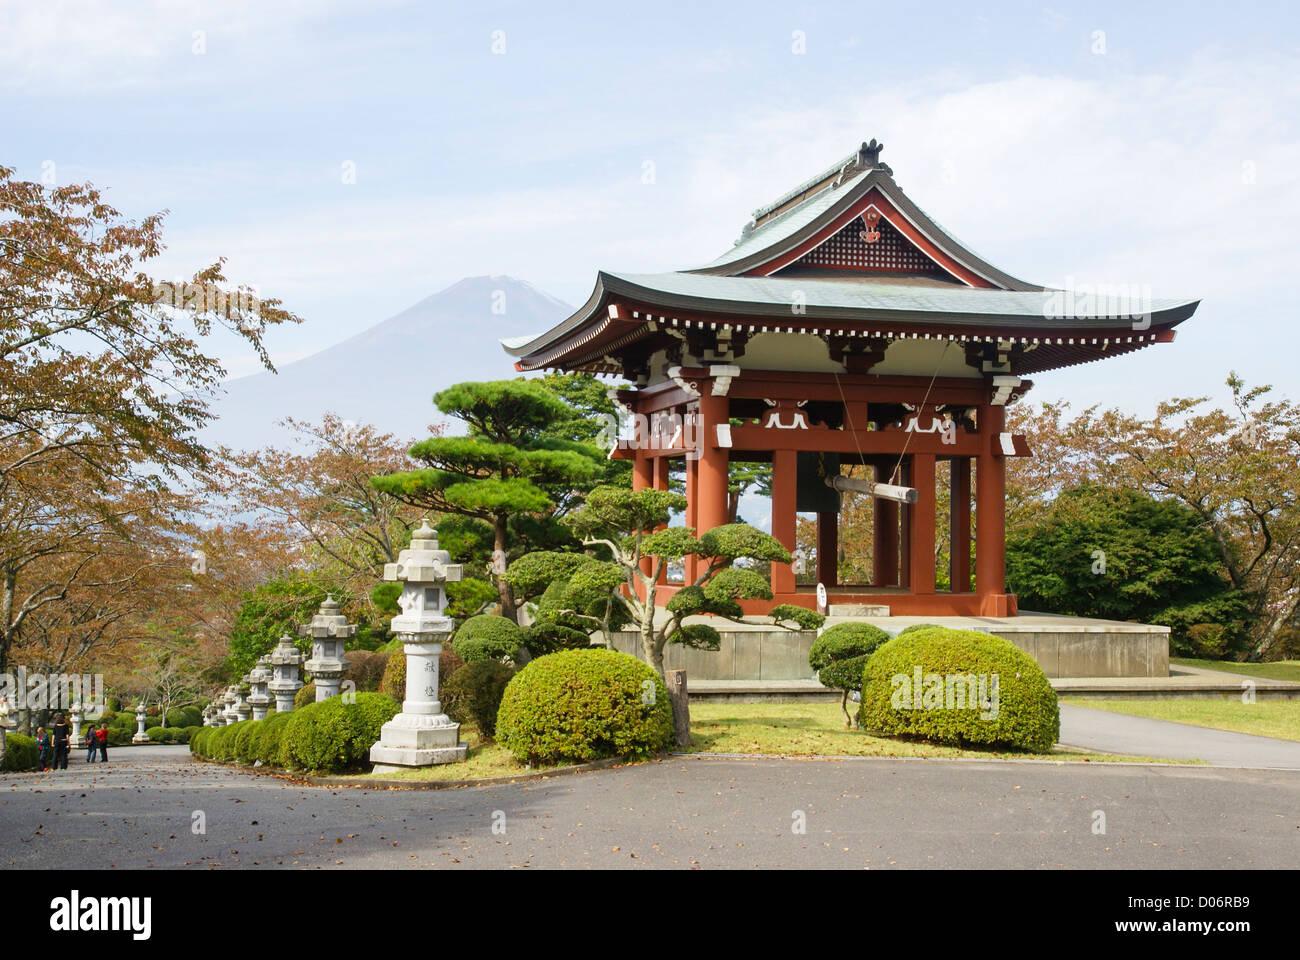 Japan, Honshu Island, Kanagawa Prefecture, Fuji Hakone National Park, Japanese garden - Stock Image